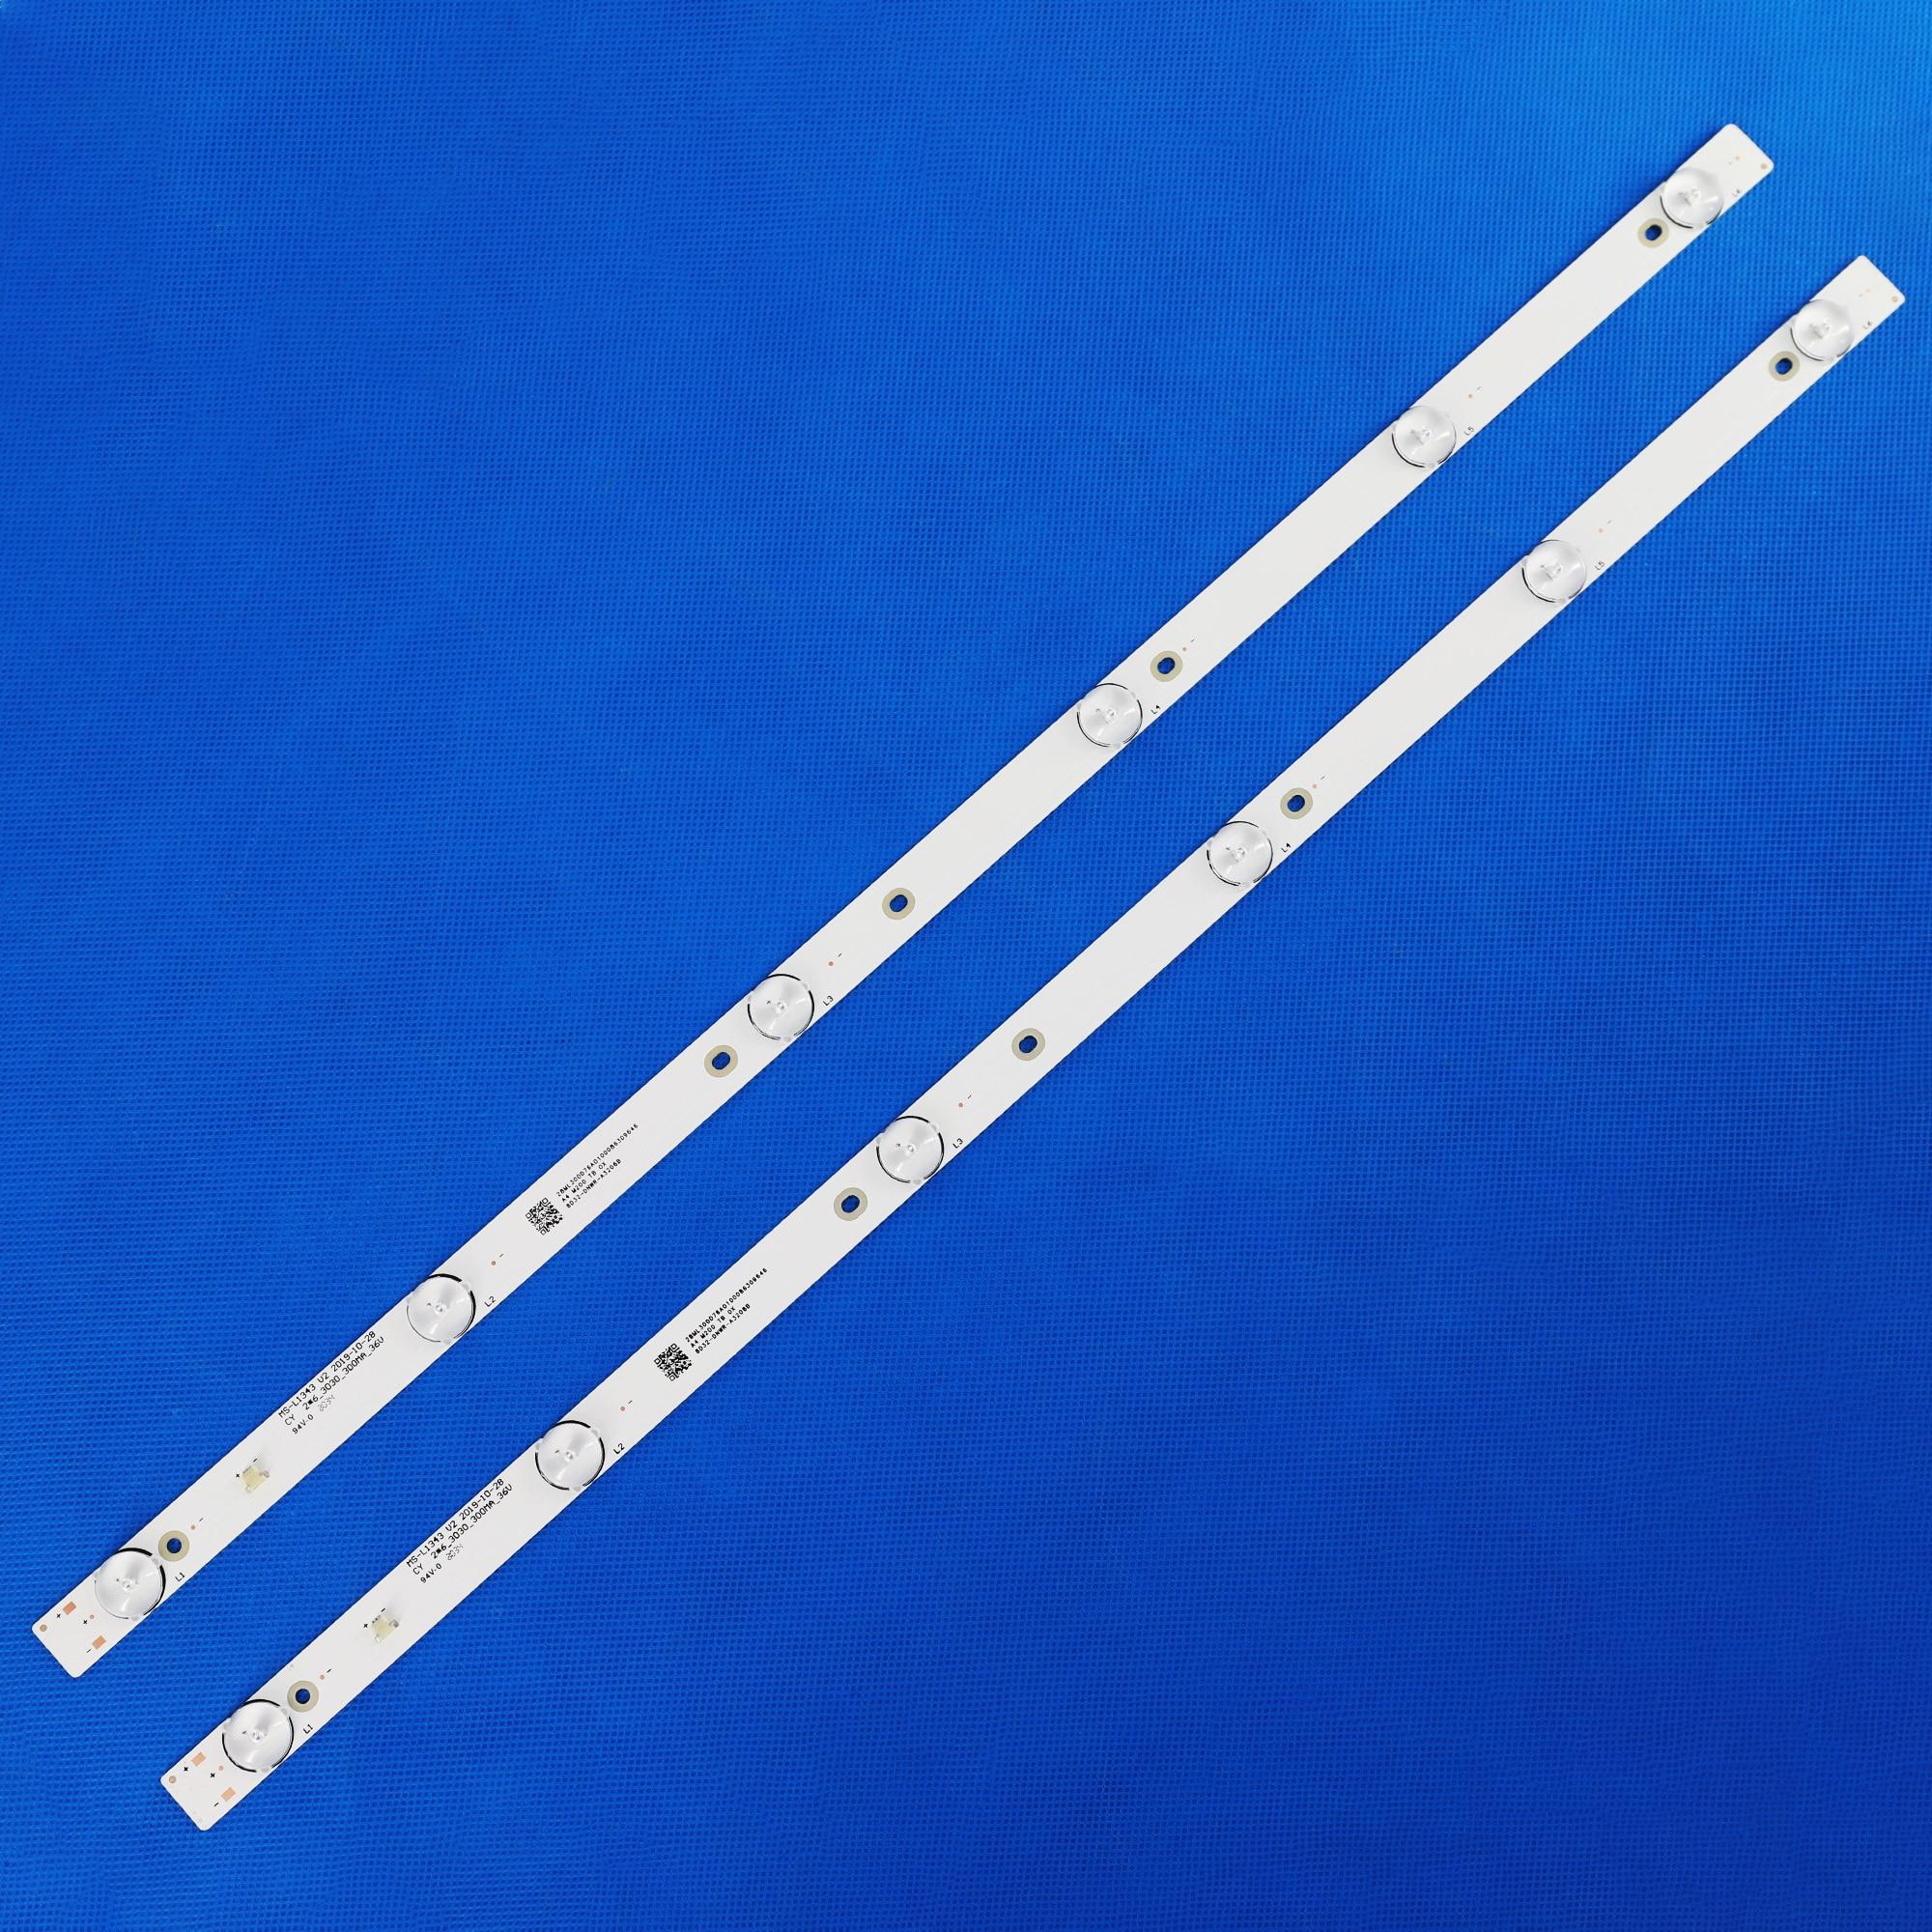 Телевизионные полосы Светодиодная лента-подсветка s MS-L1343 V1 V2, 8D32-DNWR-A3206B, 32 дюйма, светодиодные телевизионные полосы CY 2*6 _ 3030 _ 300 мА _ 36 В, линейк...